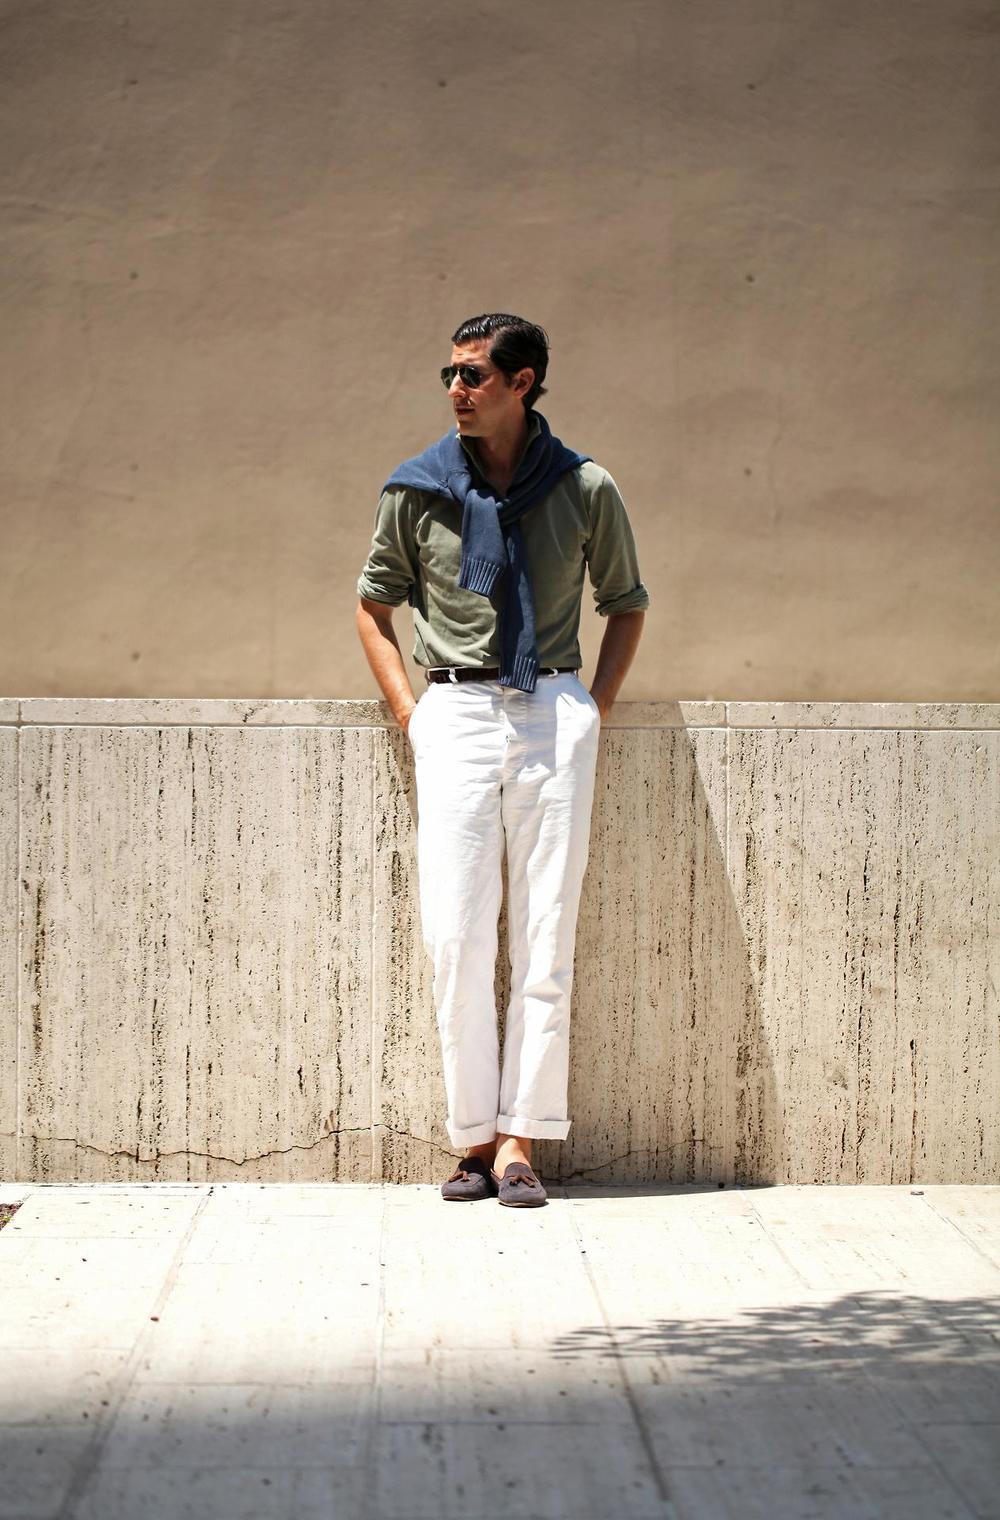 antonio-ciongoli-casual-menswear-lookbook-casual-1472645766.jpg